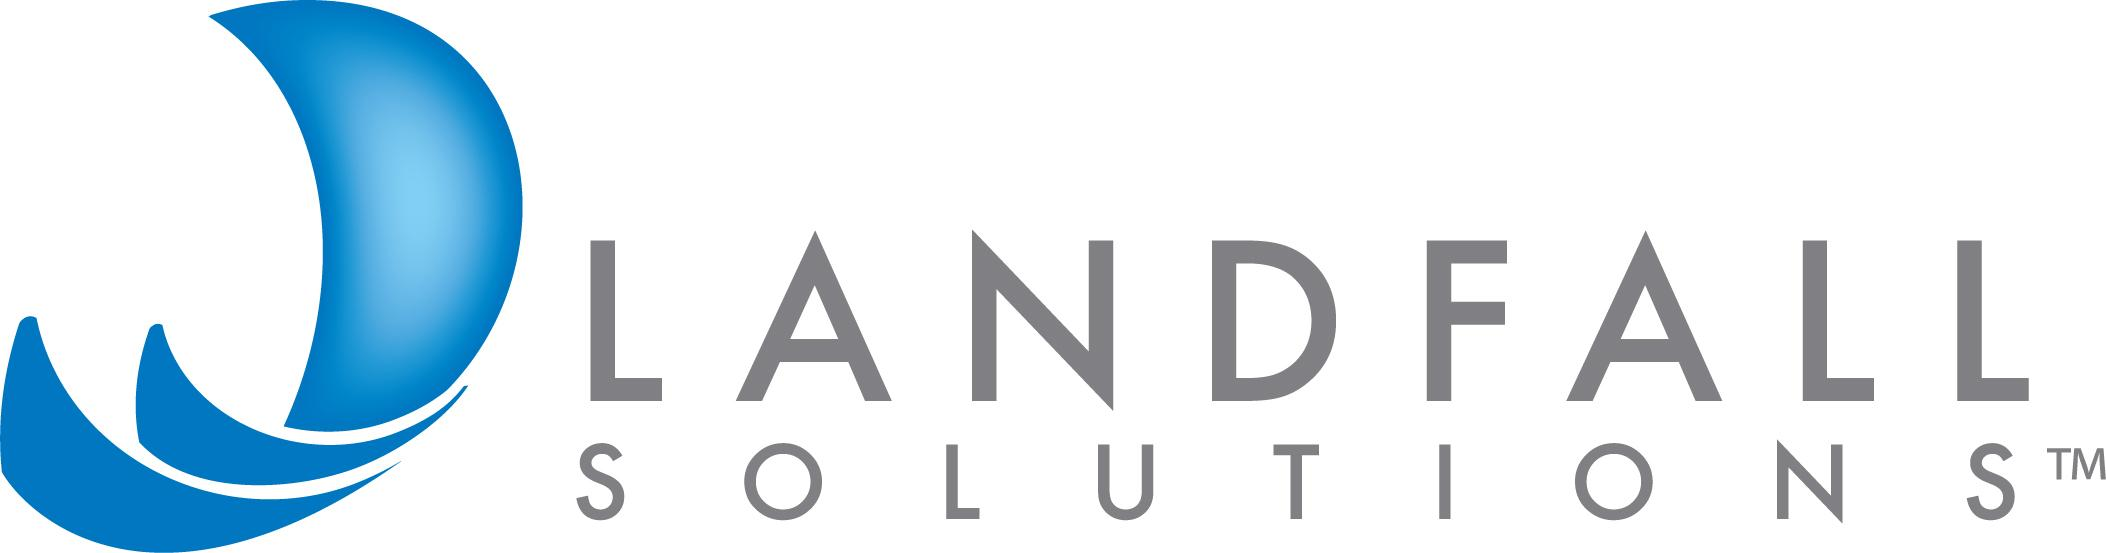 LANDFALL Solutions